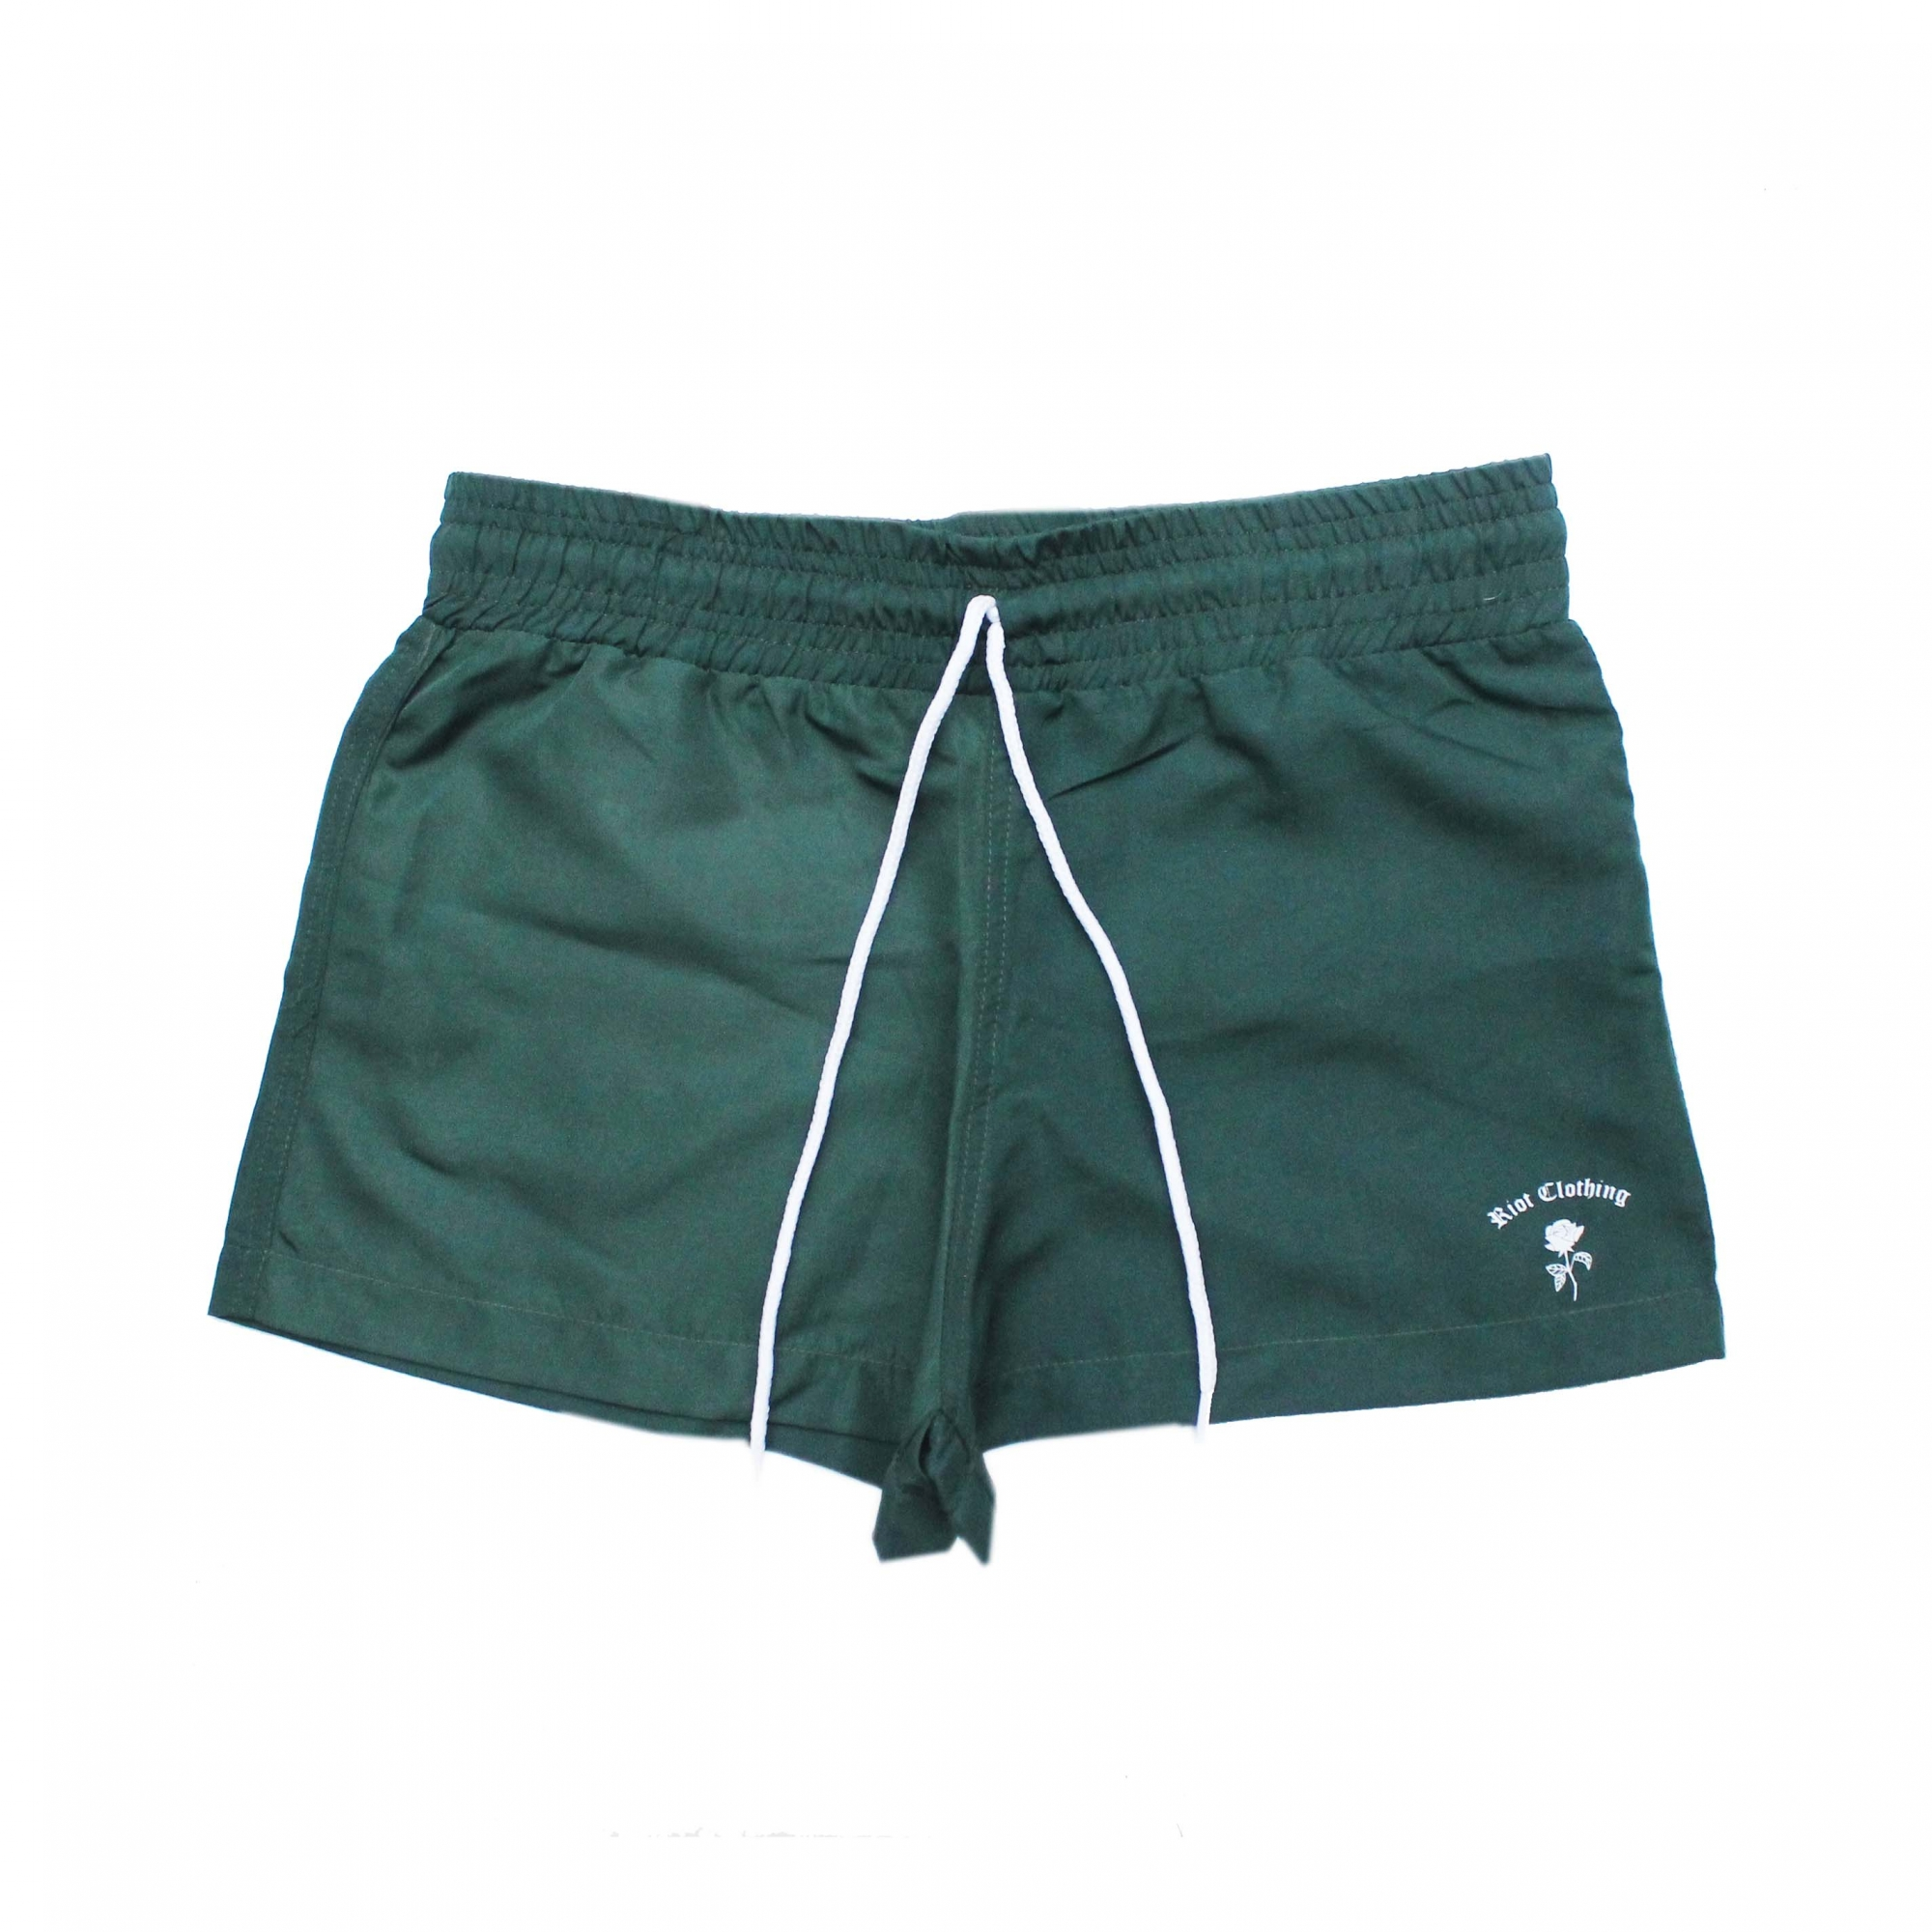 Shorts Riot Beach Tactel - Verde Escuro